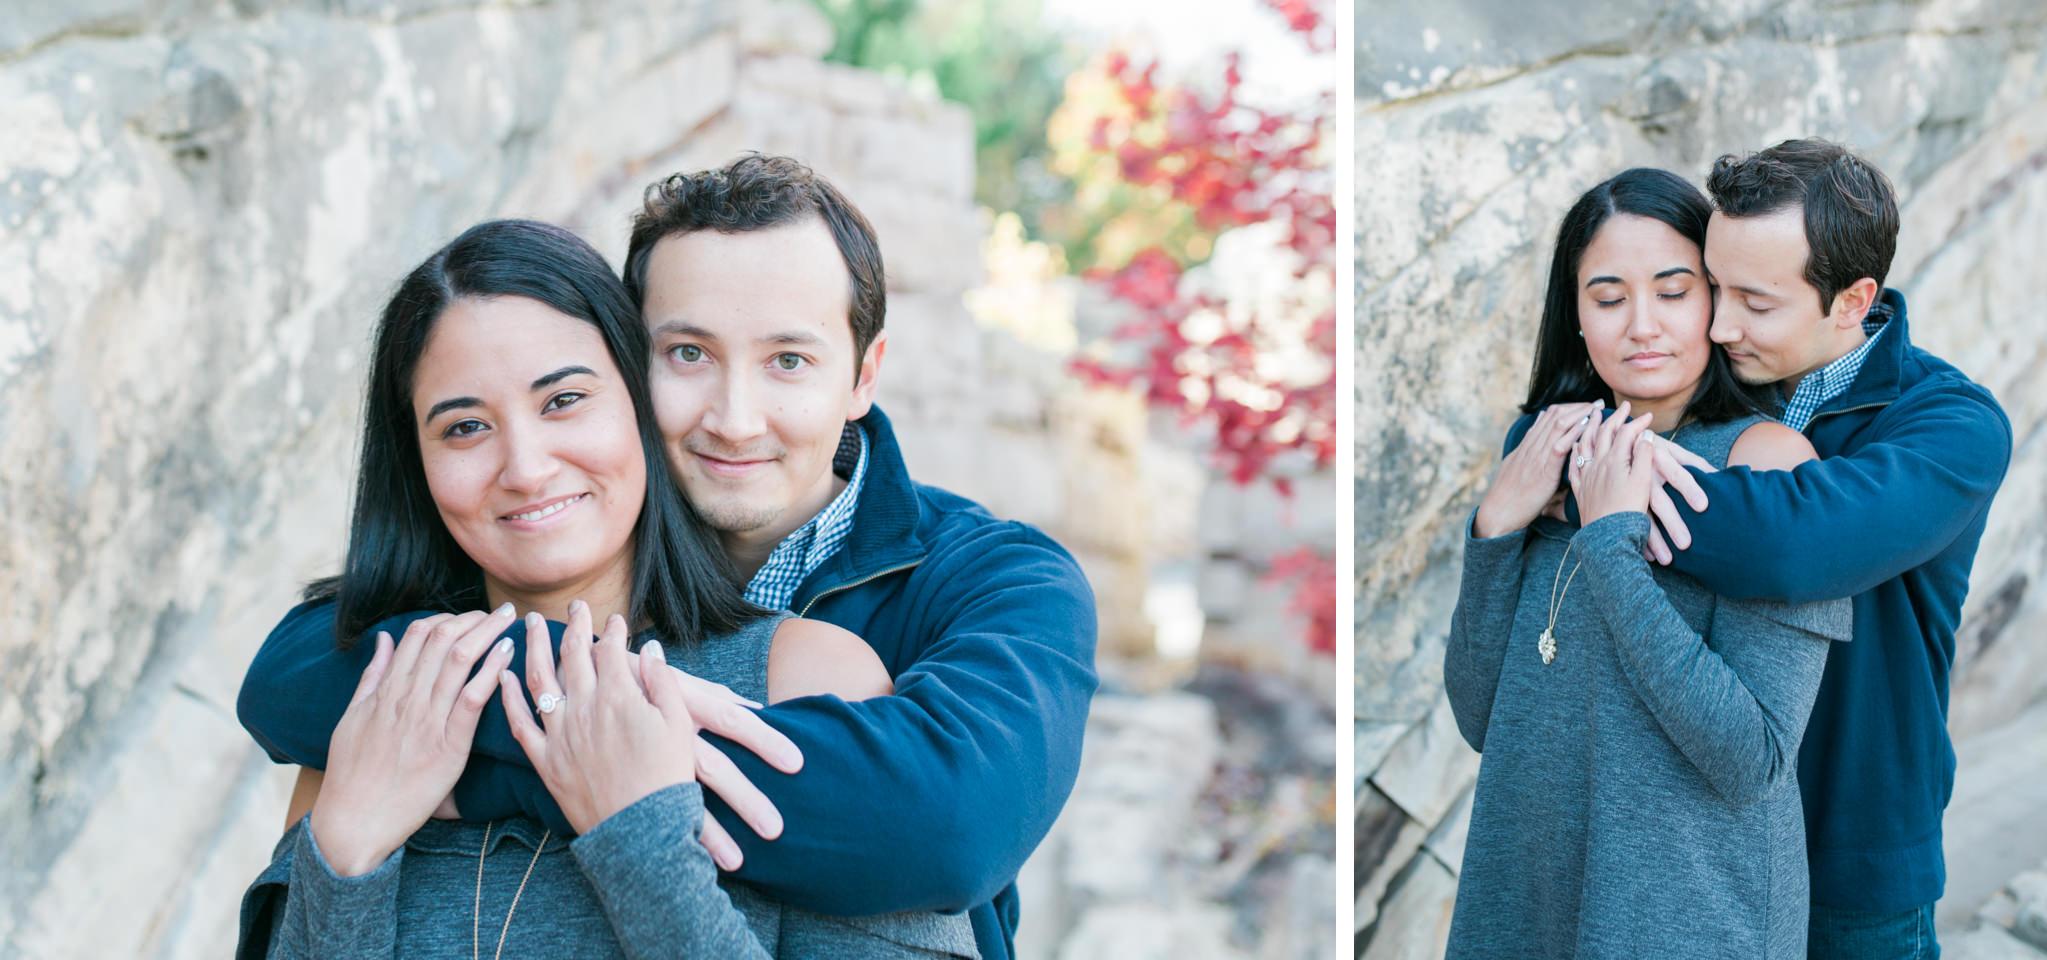 State College Pennsylvania wedding photographer jayclara (8).jpg